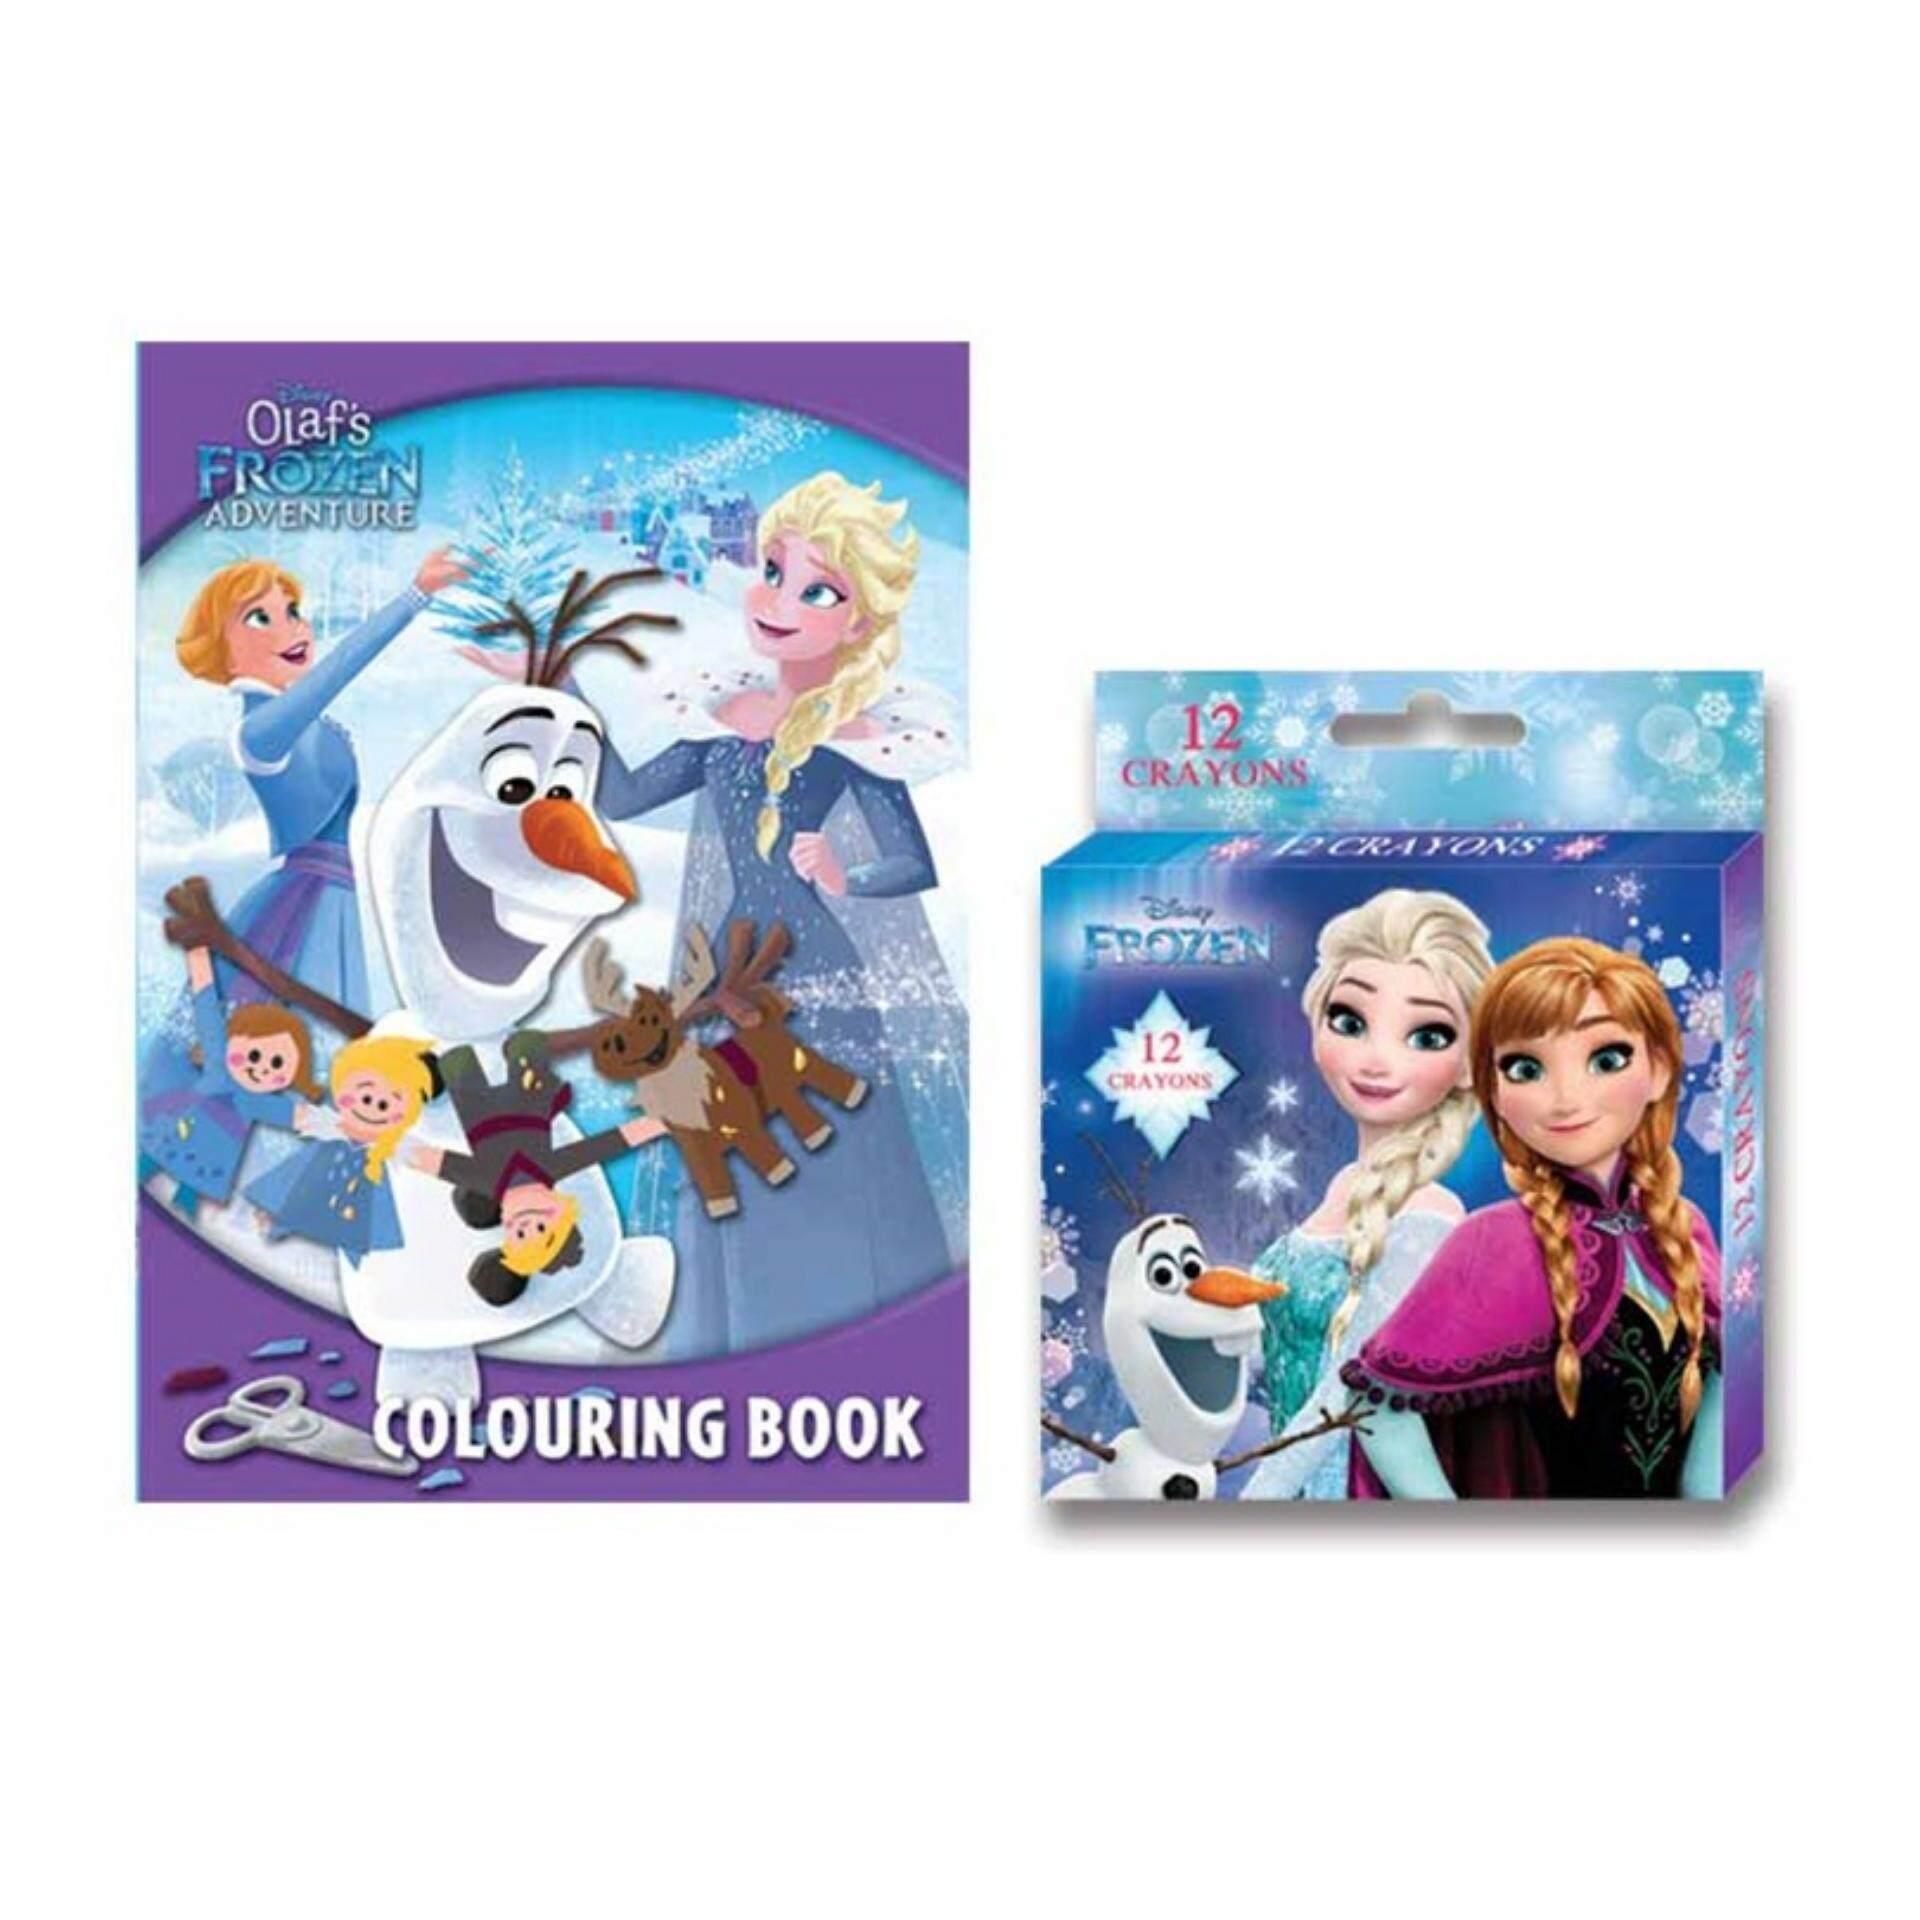 Disney Princess Frozen Activity Book With Crayon Set - Light Blue Colour